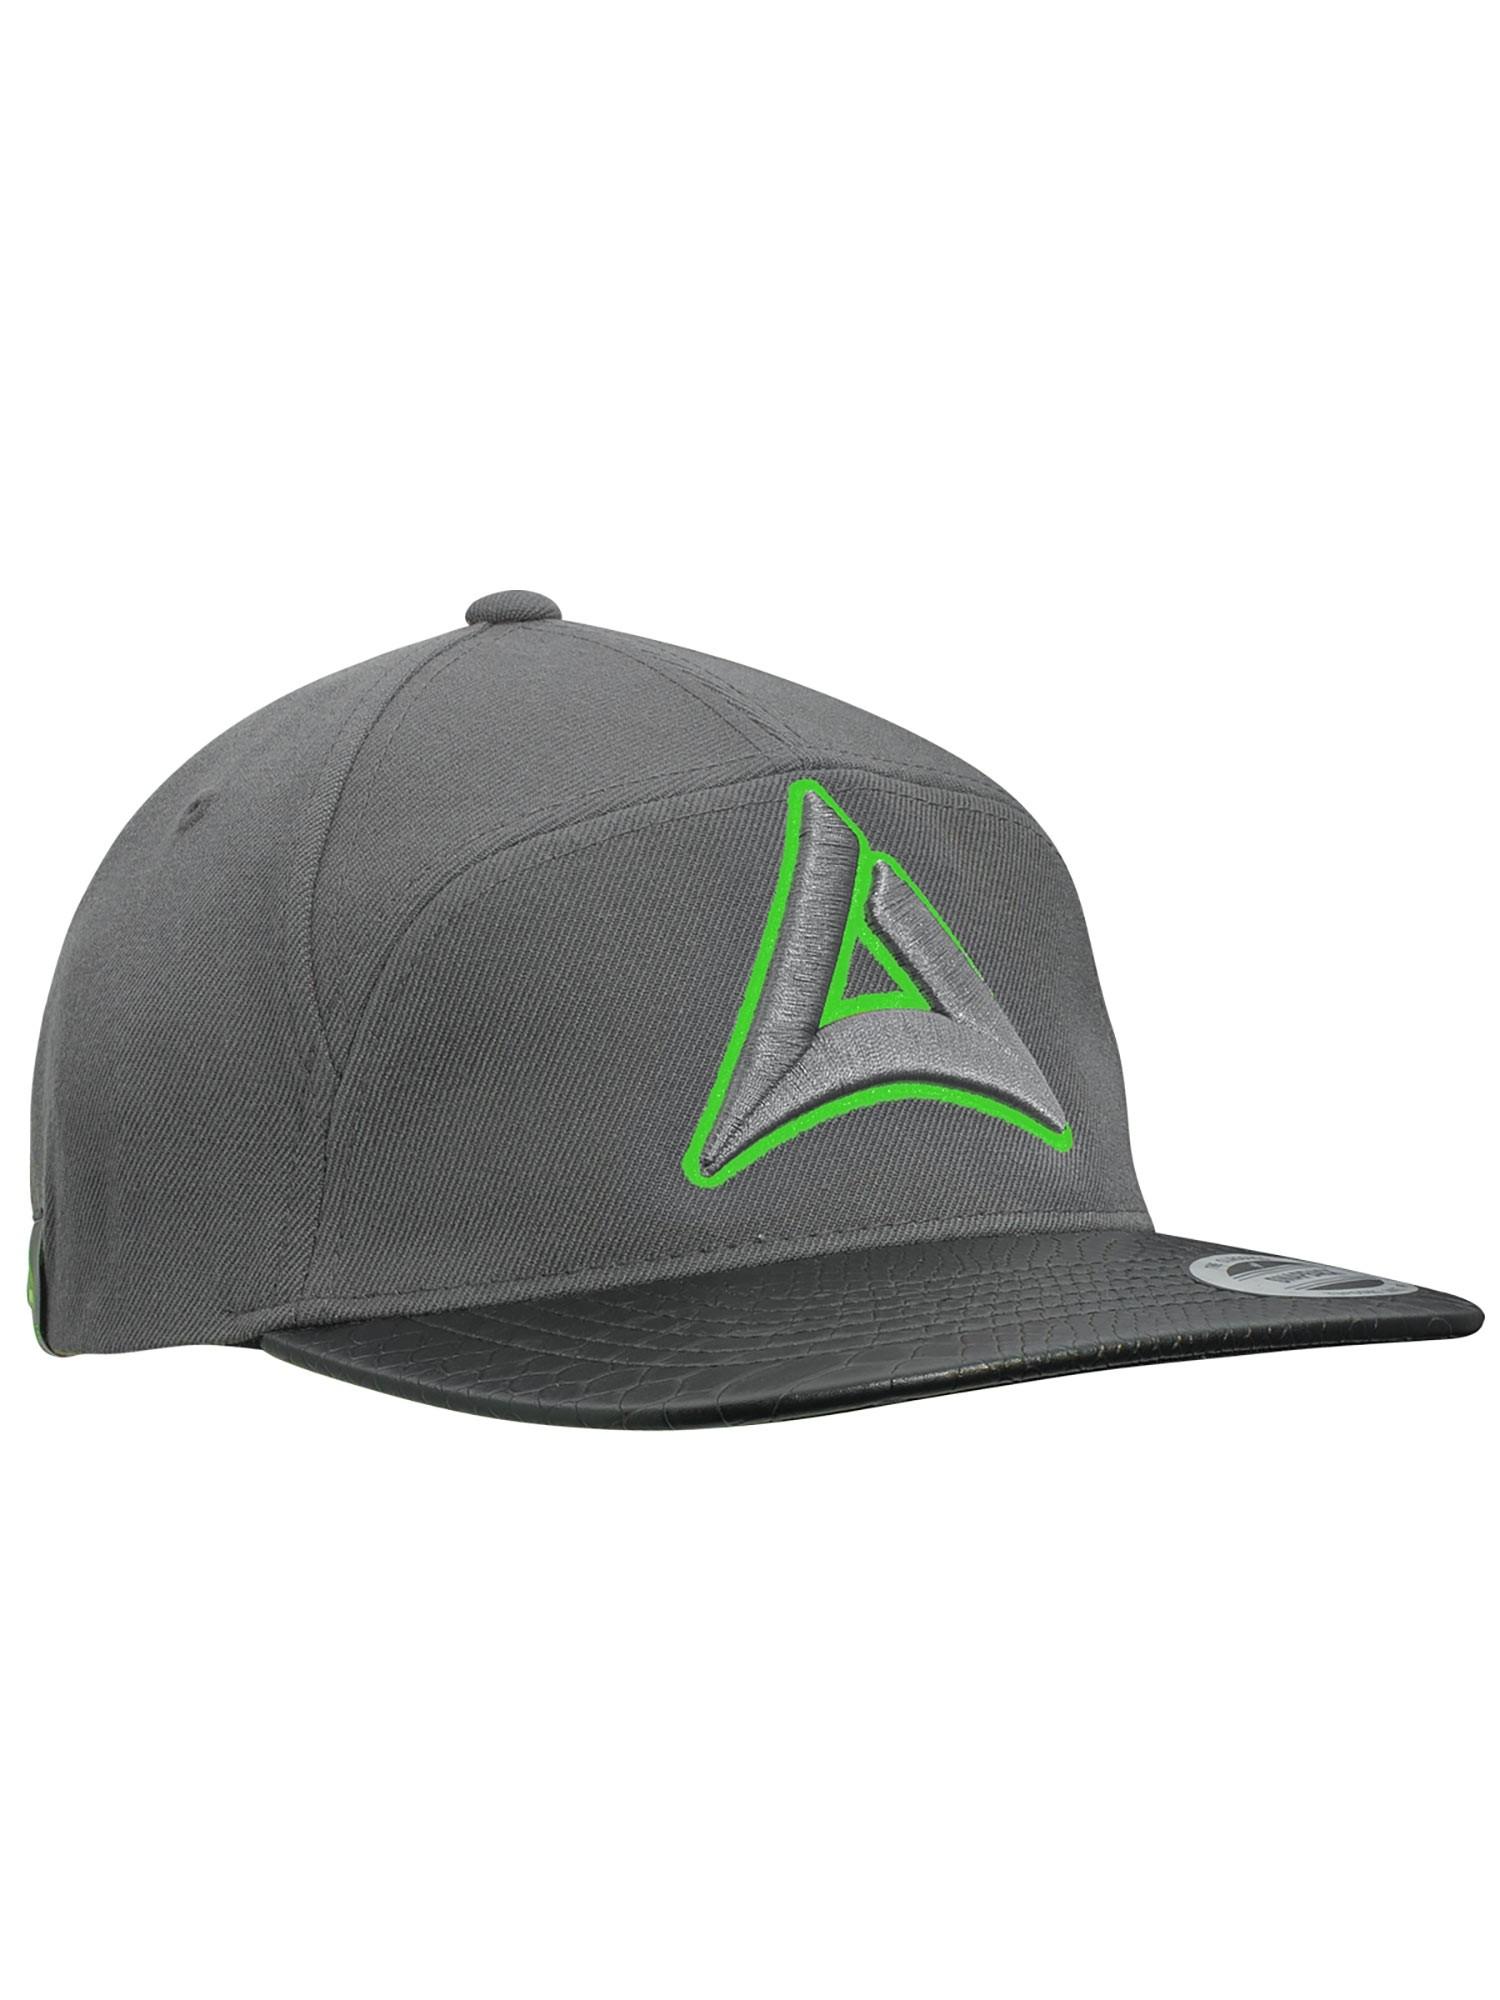 "Snapback Base Cap ""ARCUS"" black/grey"